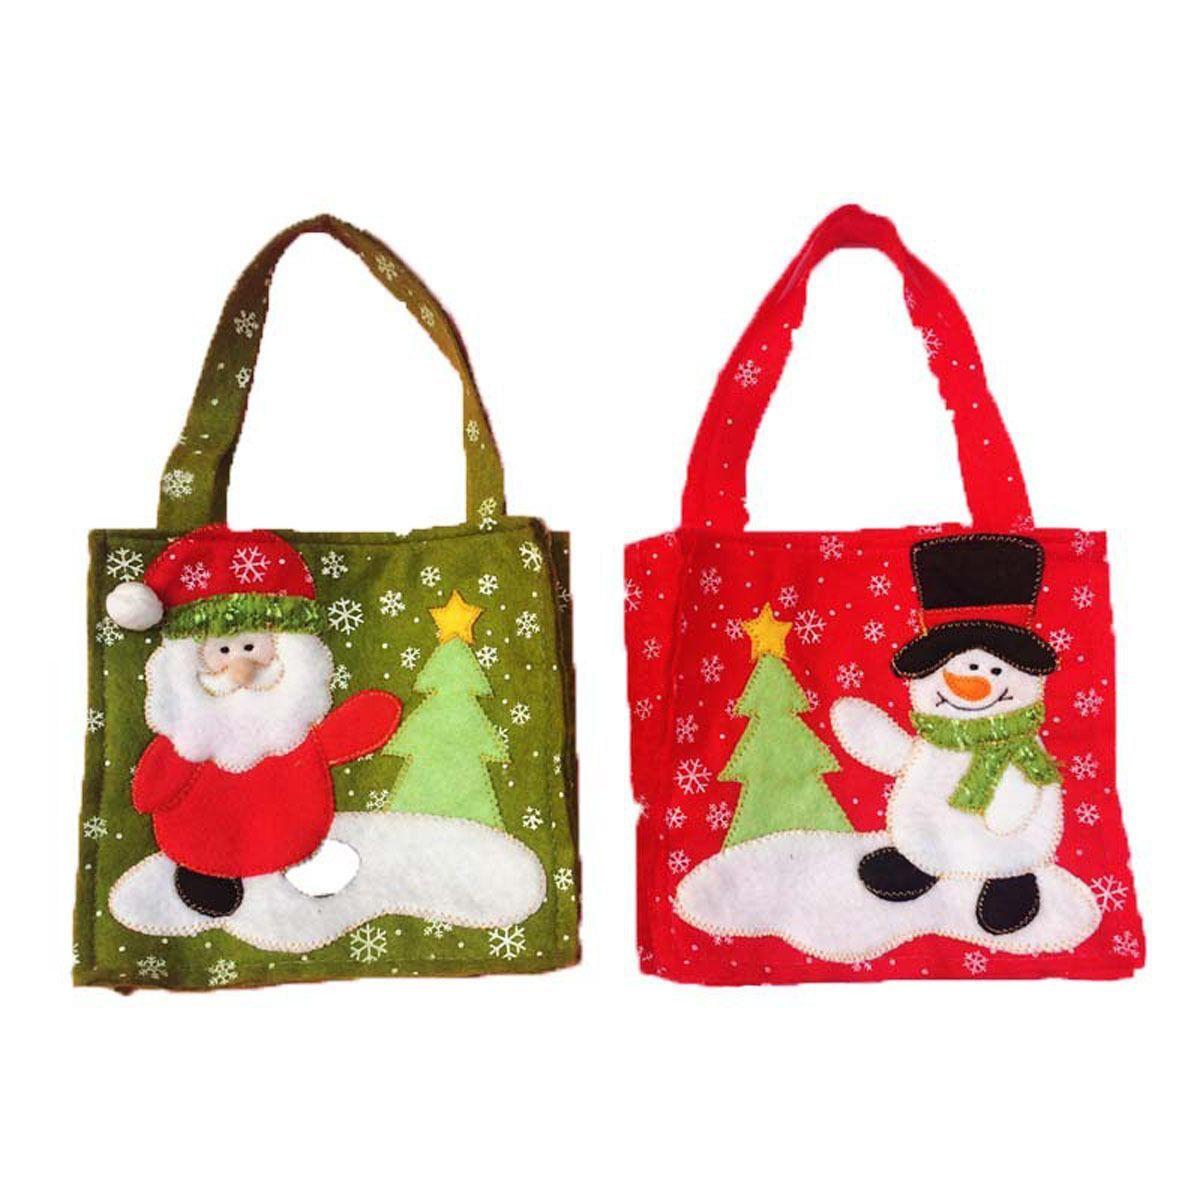 Xmas//Christmas Santa Pants Candy Bag Sack Red Filler Decor Party Snowman Gift